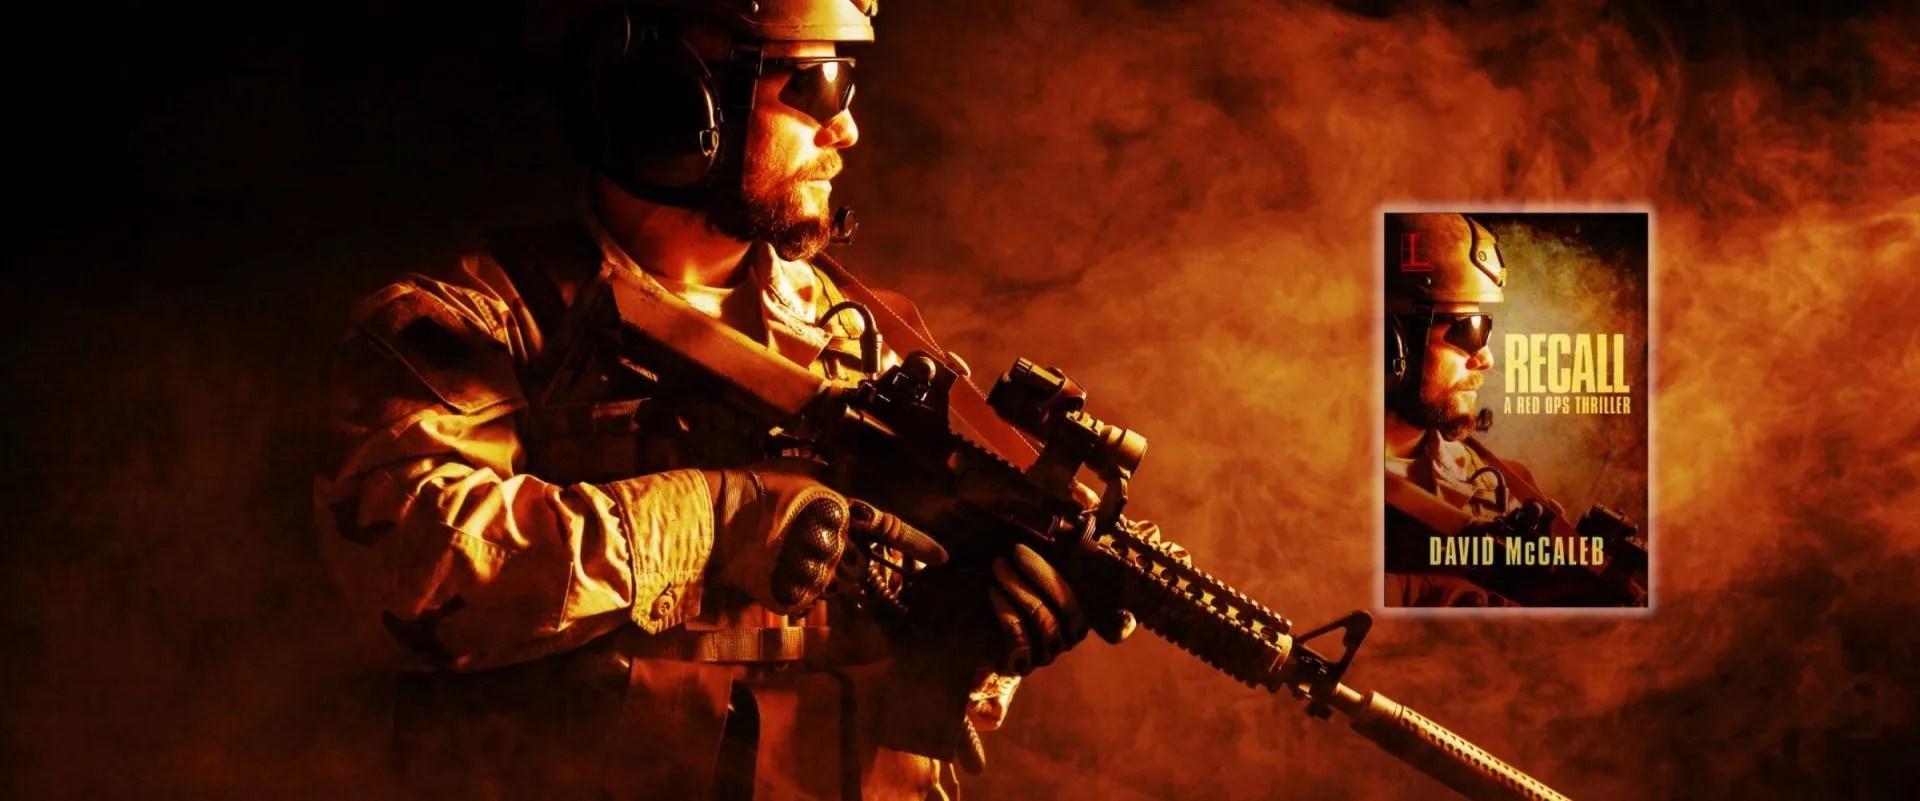 Special ops soldier, header RECALL slider image